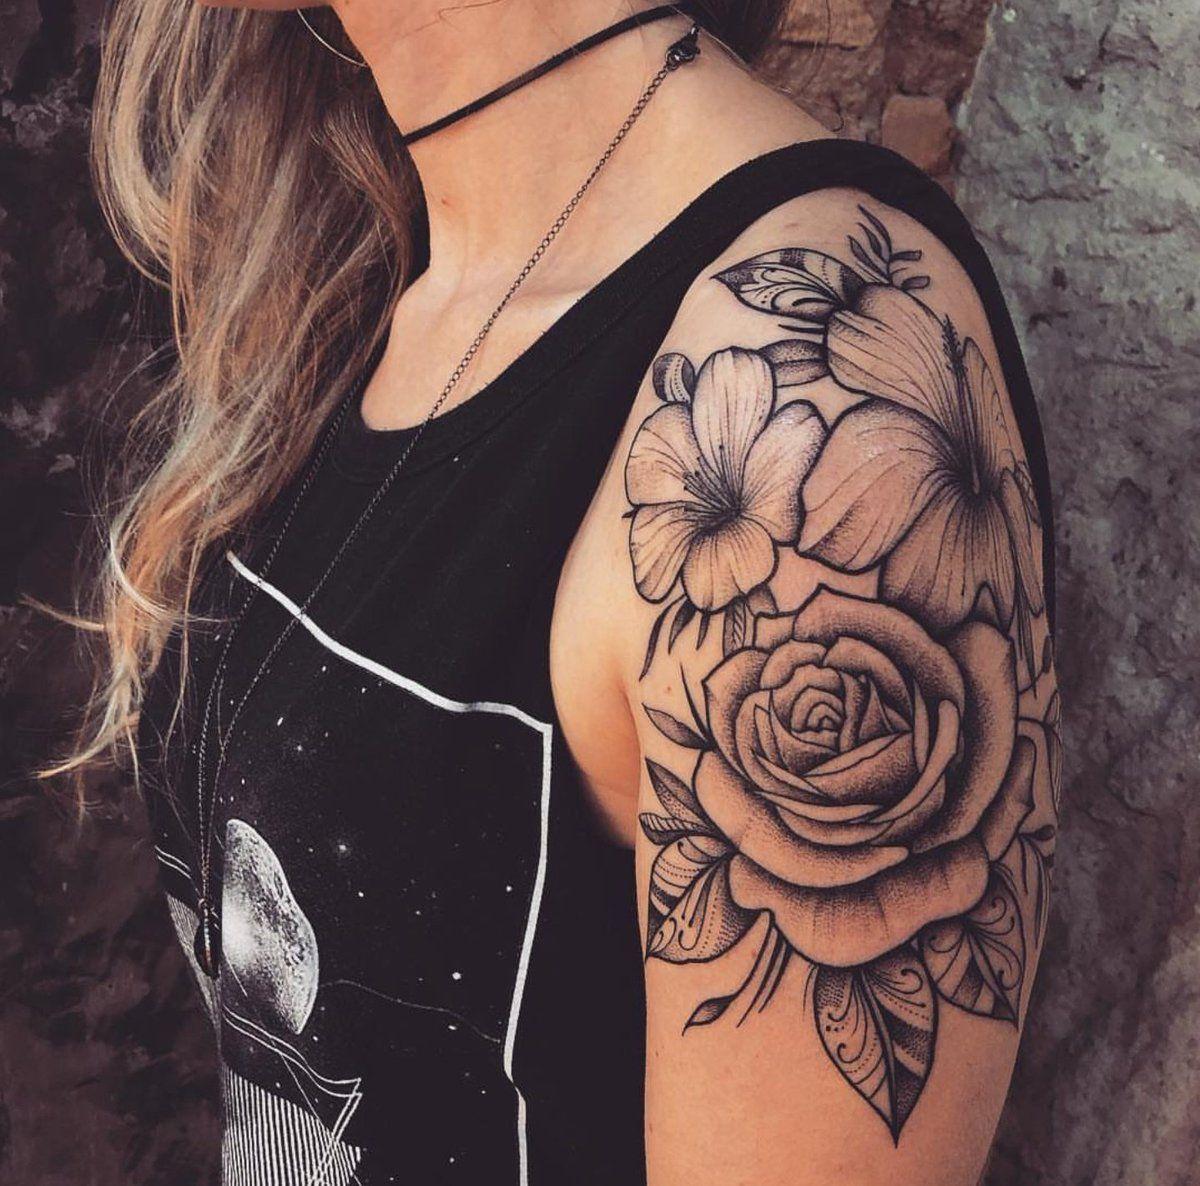 Tattoos On Twitter Shoulder Tattoos For Women Shoulder Sleeve Tattoos Mens Shoulder Tattoo